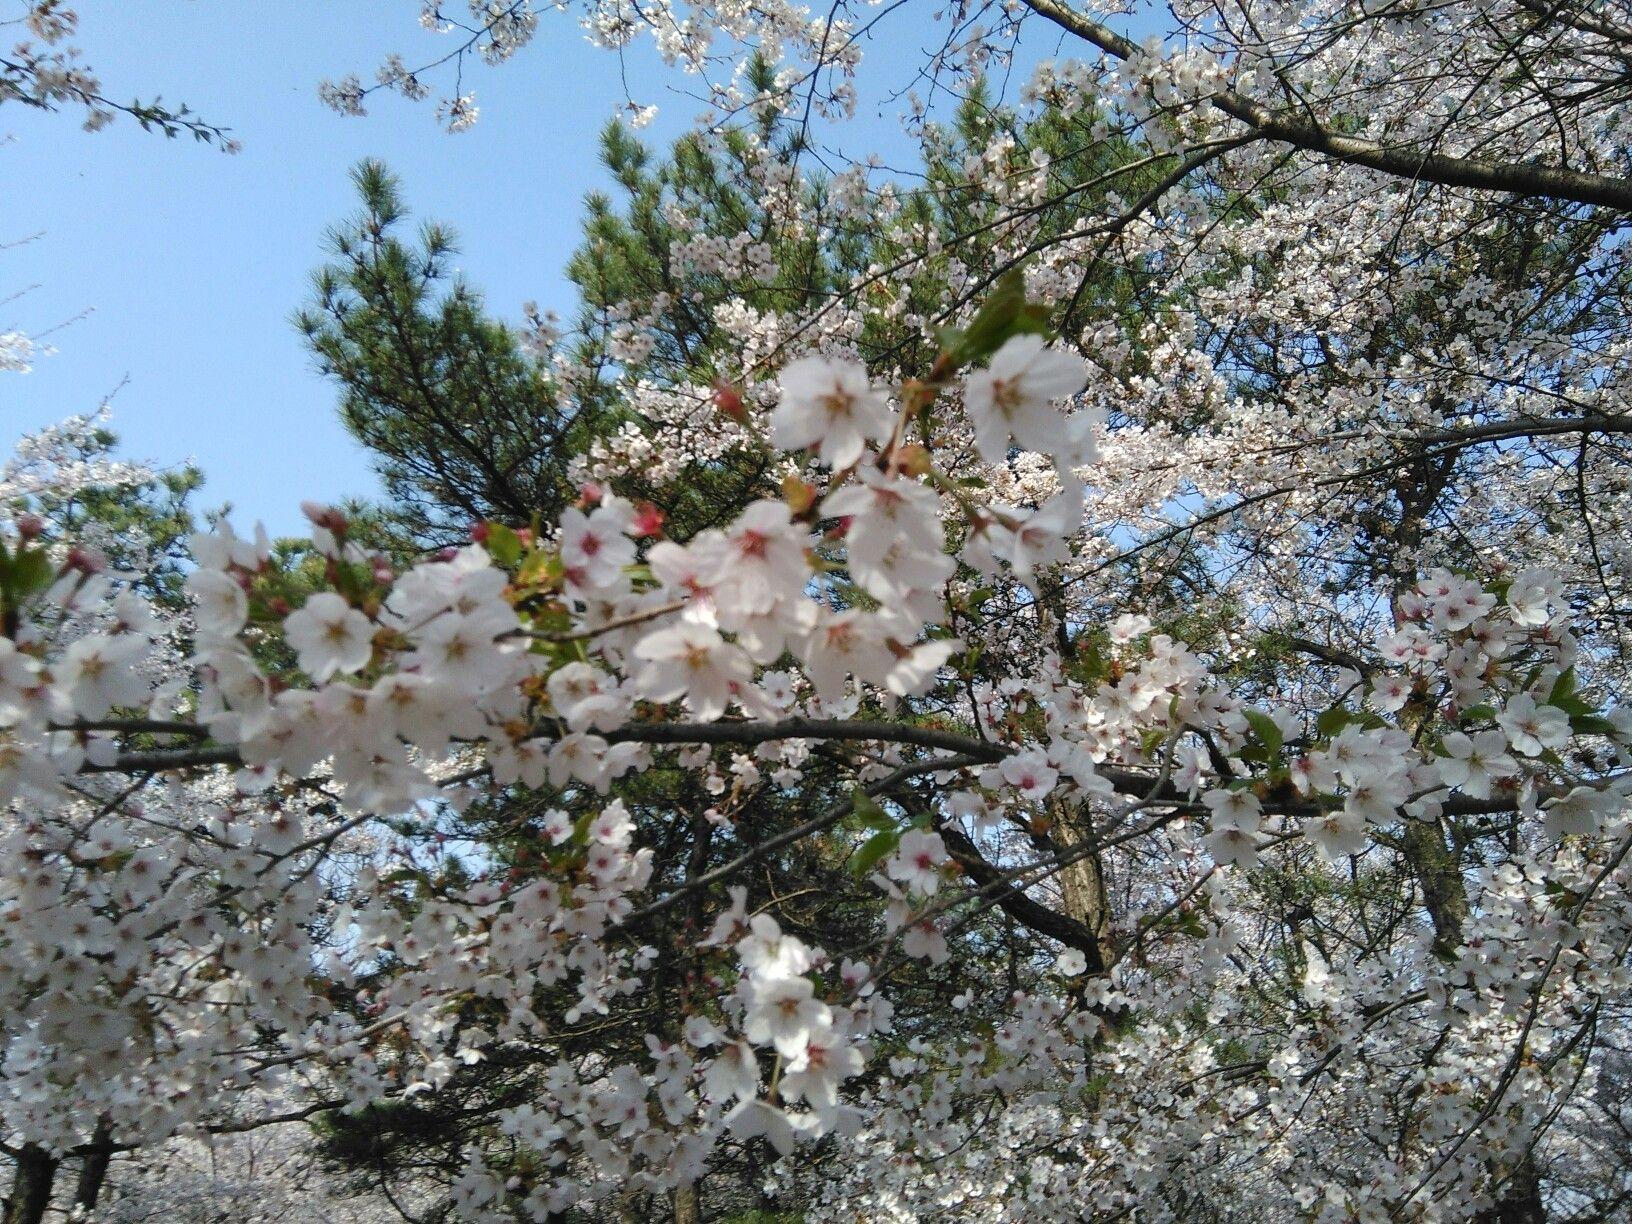 Cherry Blossoms Palawan 5 Cnnph Jpg Cherry Blossom Blossom Puerto Princesa